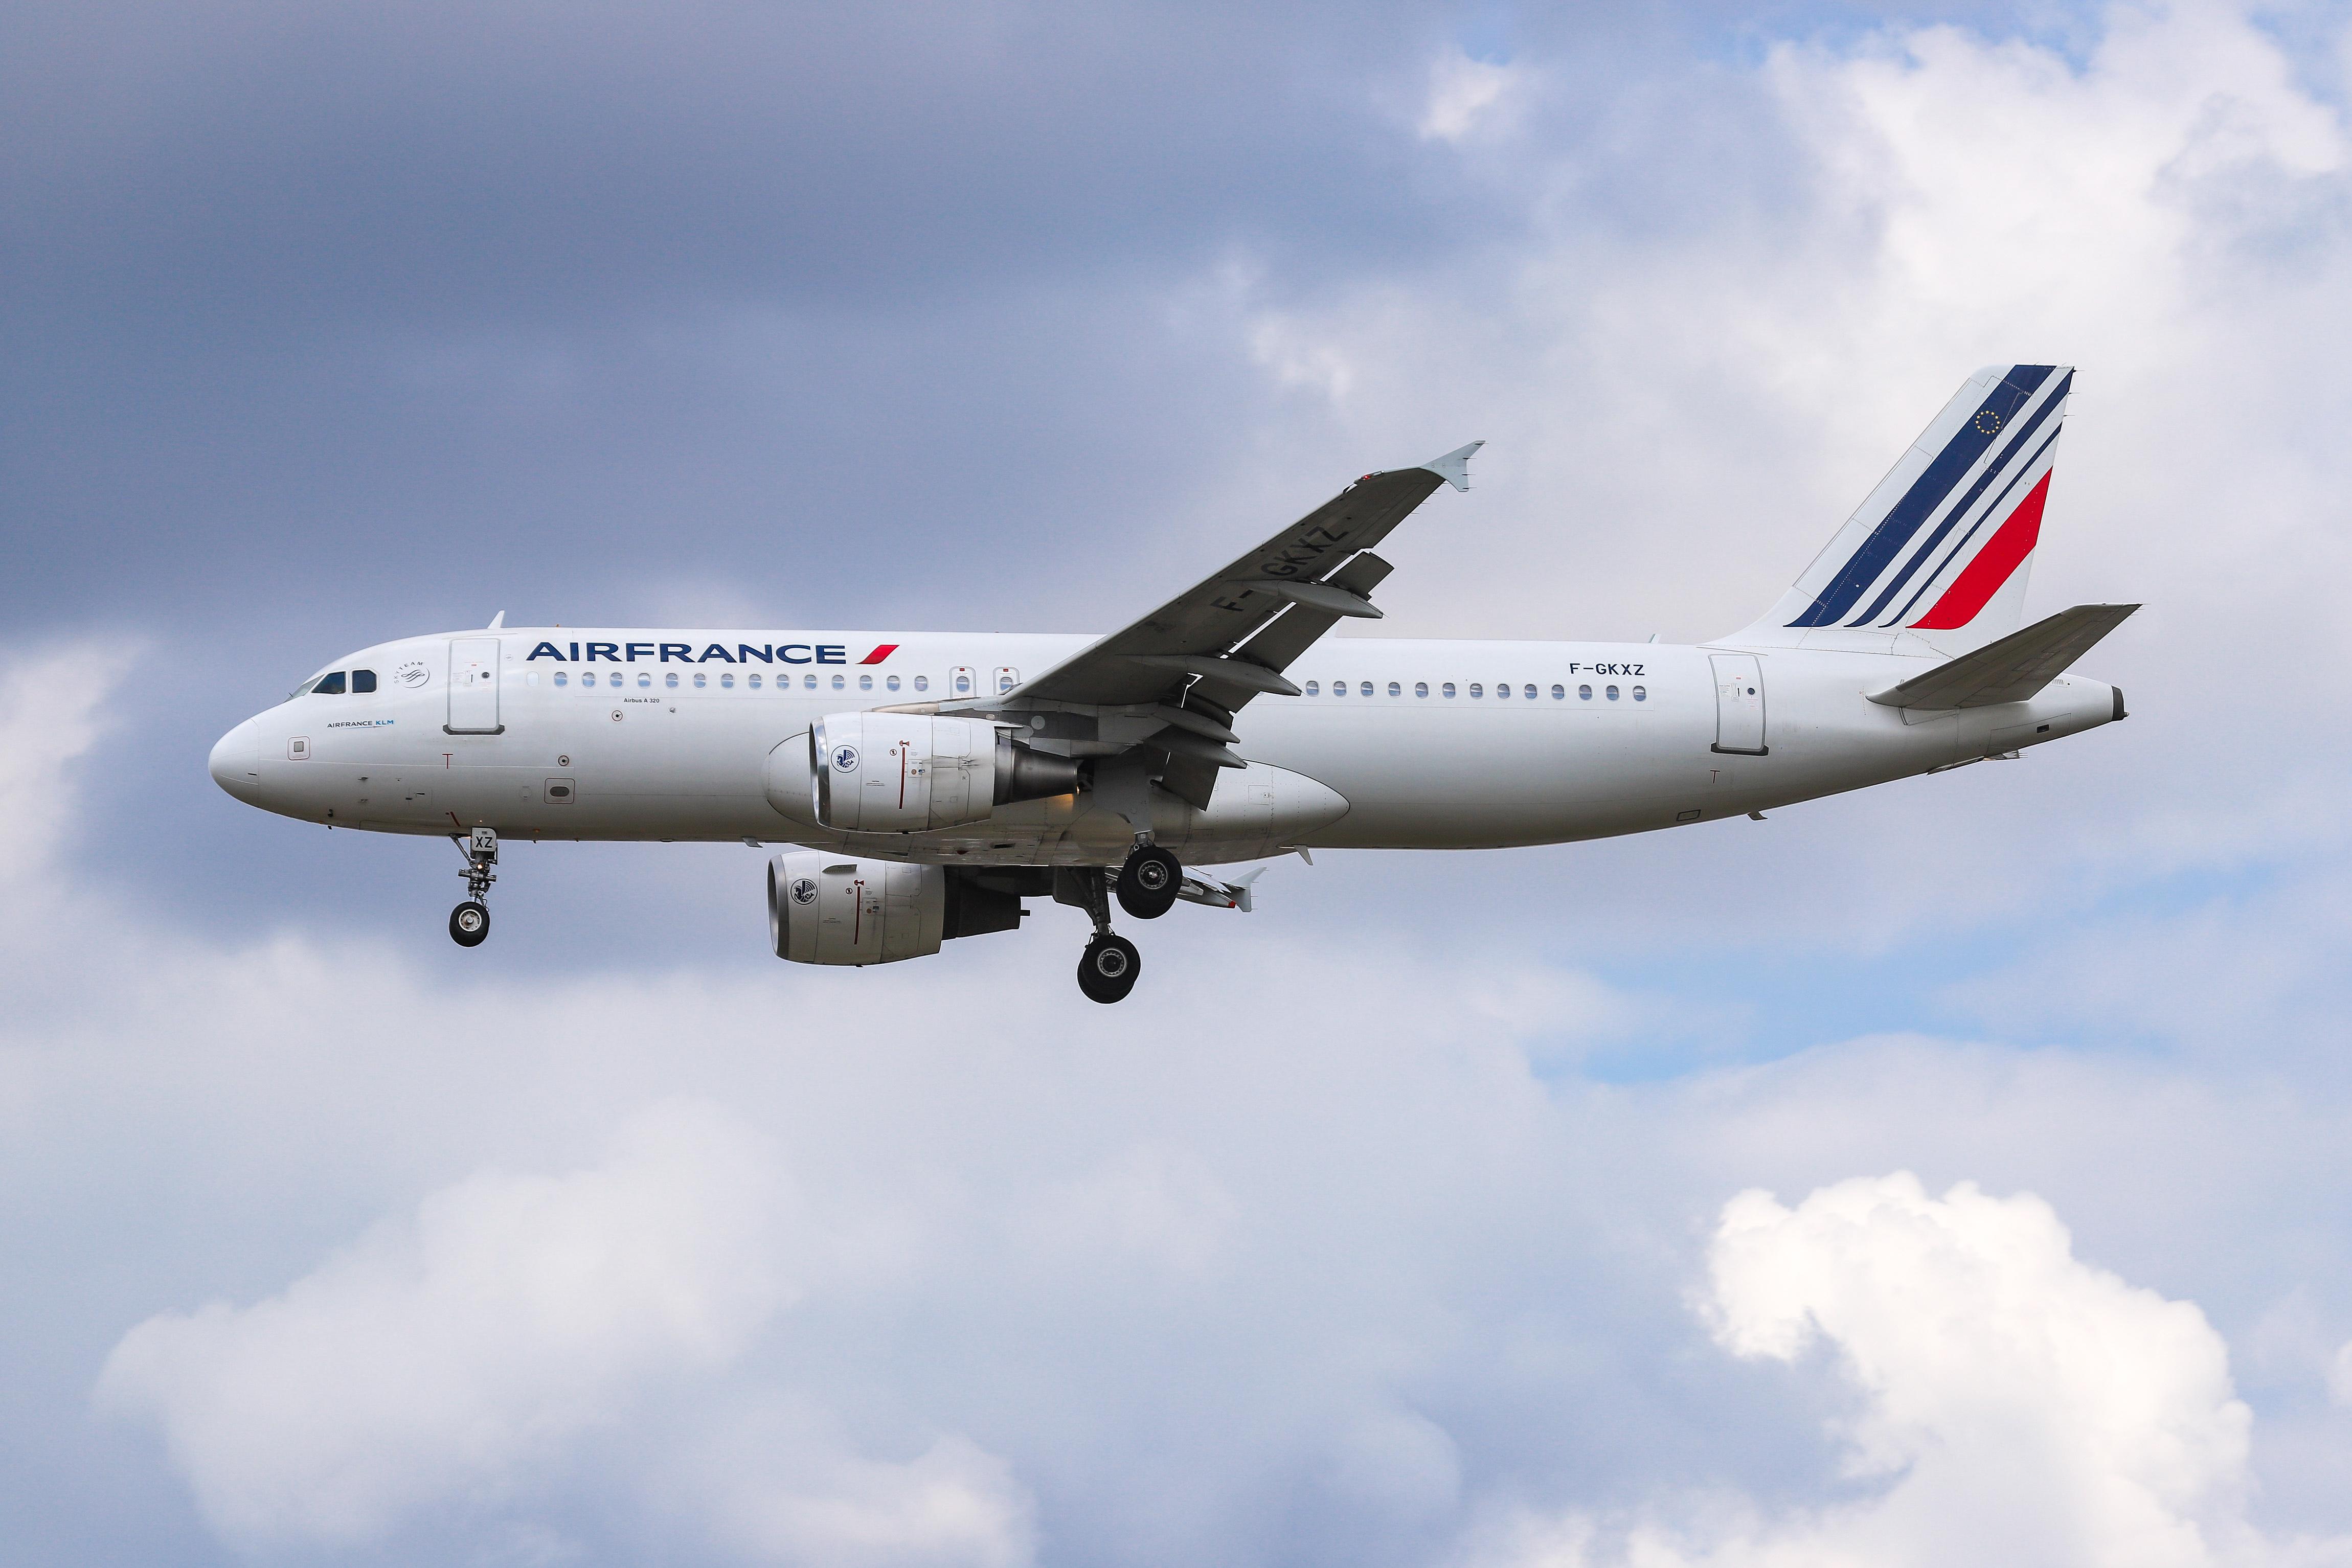 An Air France Airbus A320 plane landing on Aug. 23, 2019.